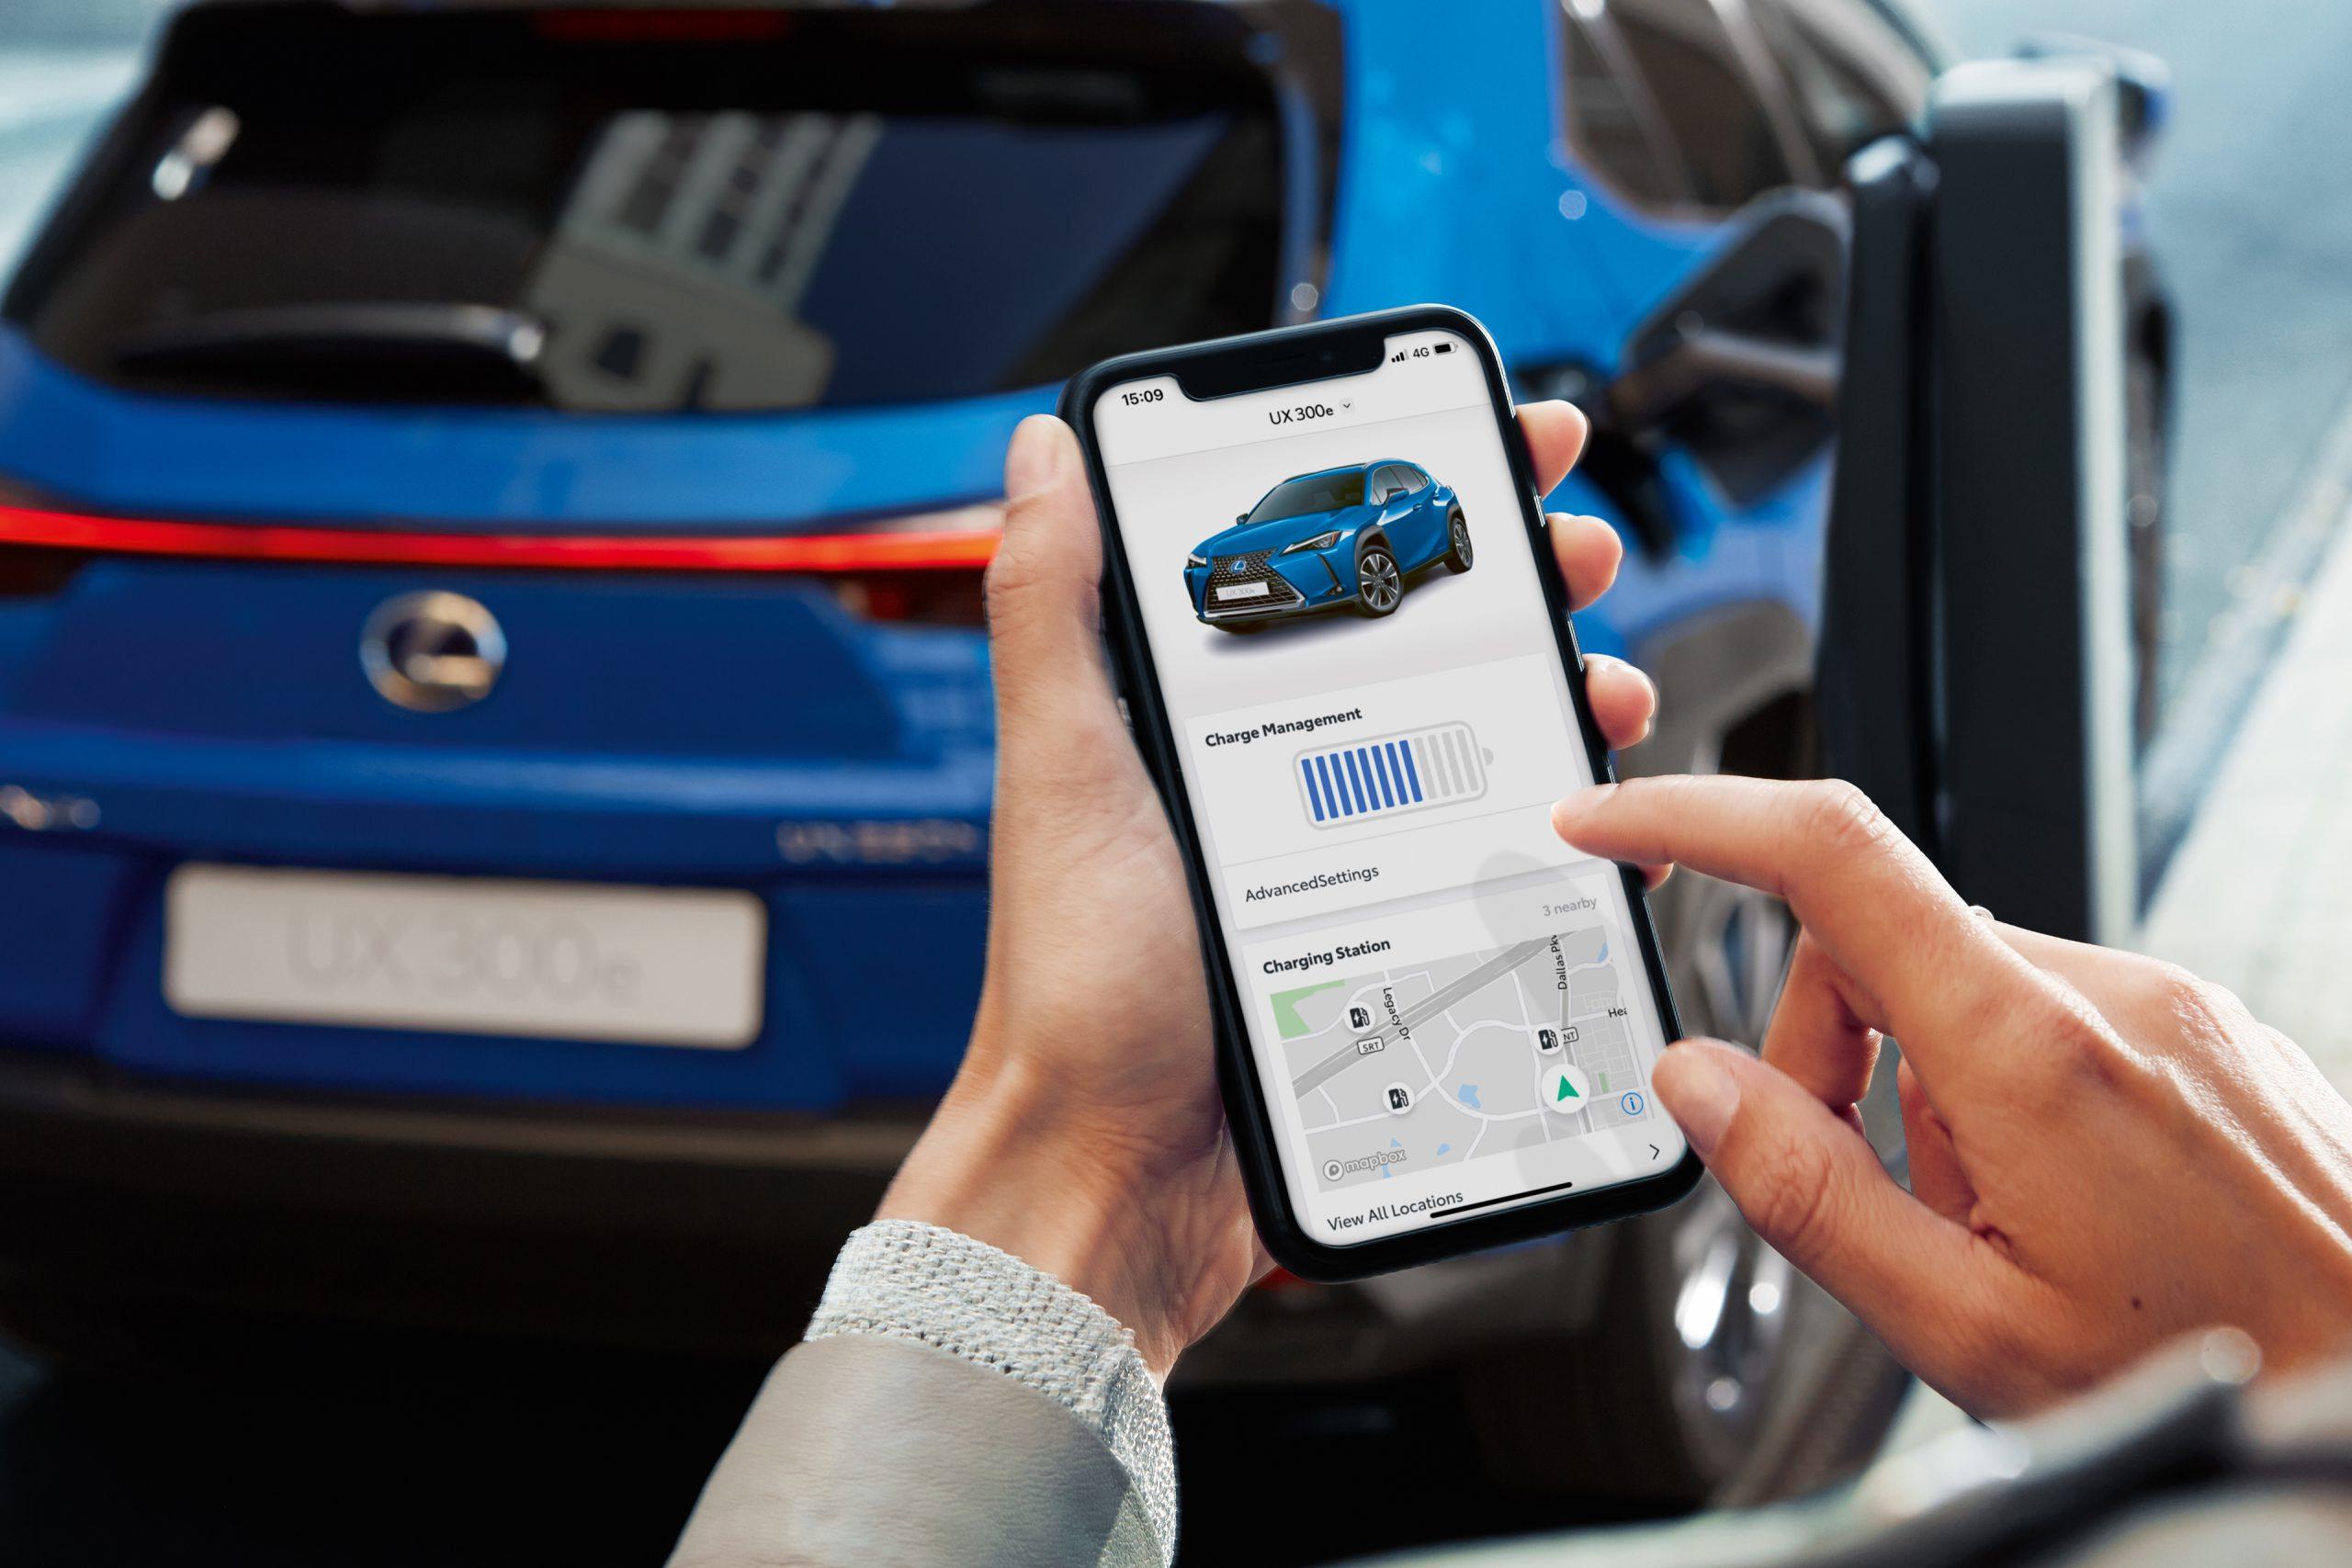 Lexus UX 300e app